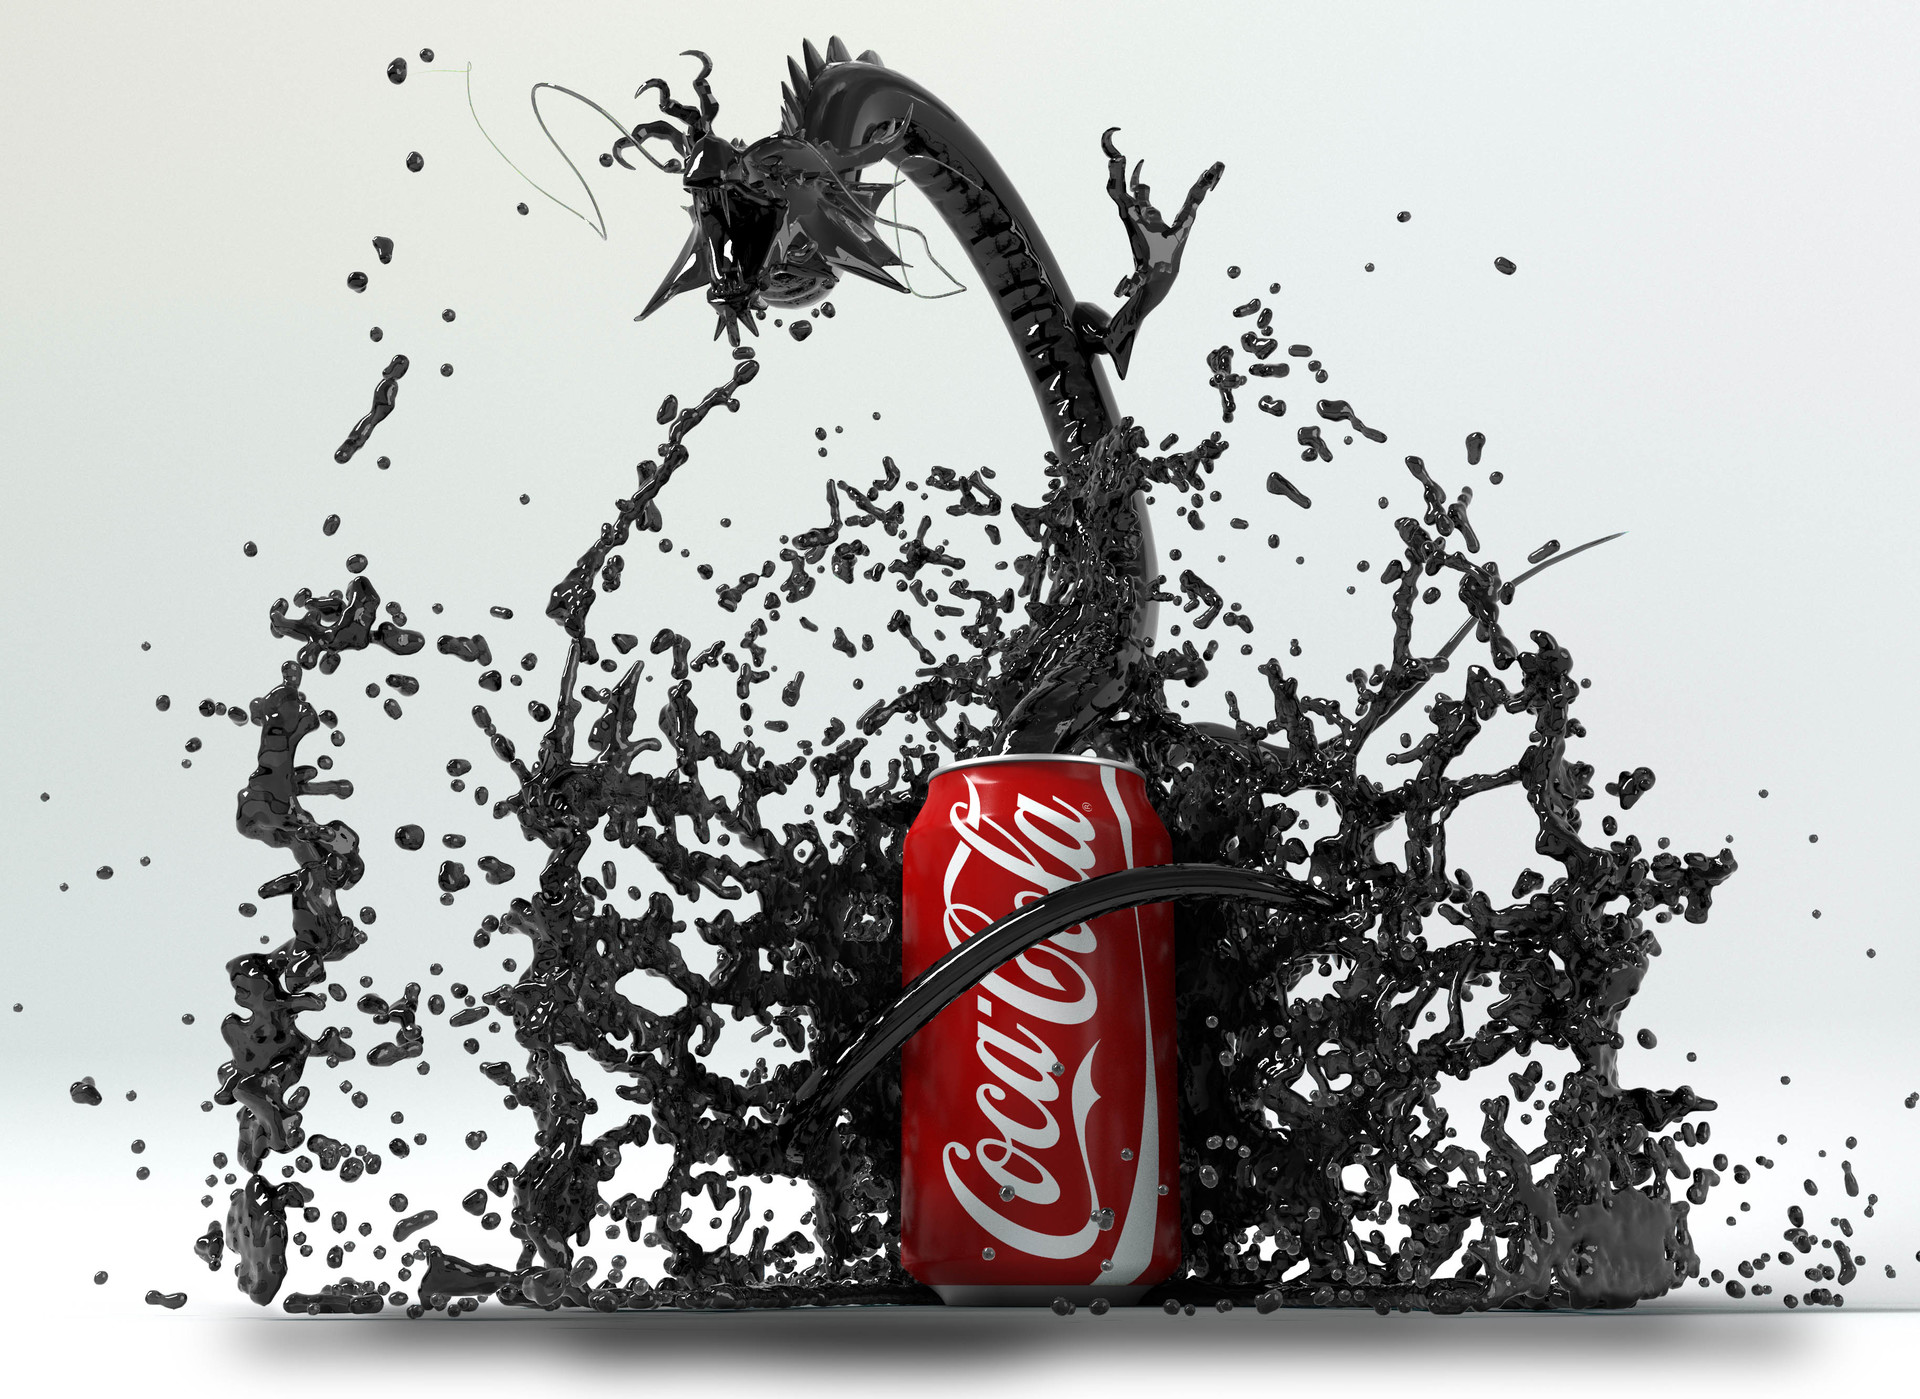 Hugo matilde coca cola